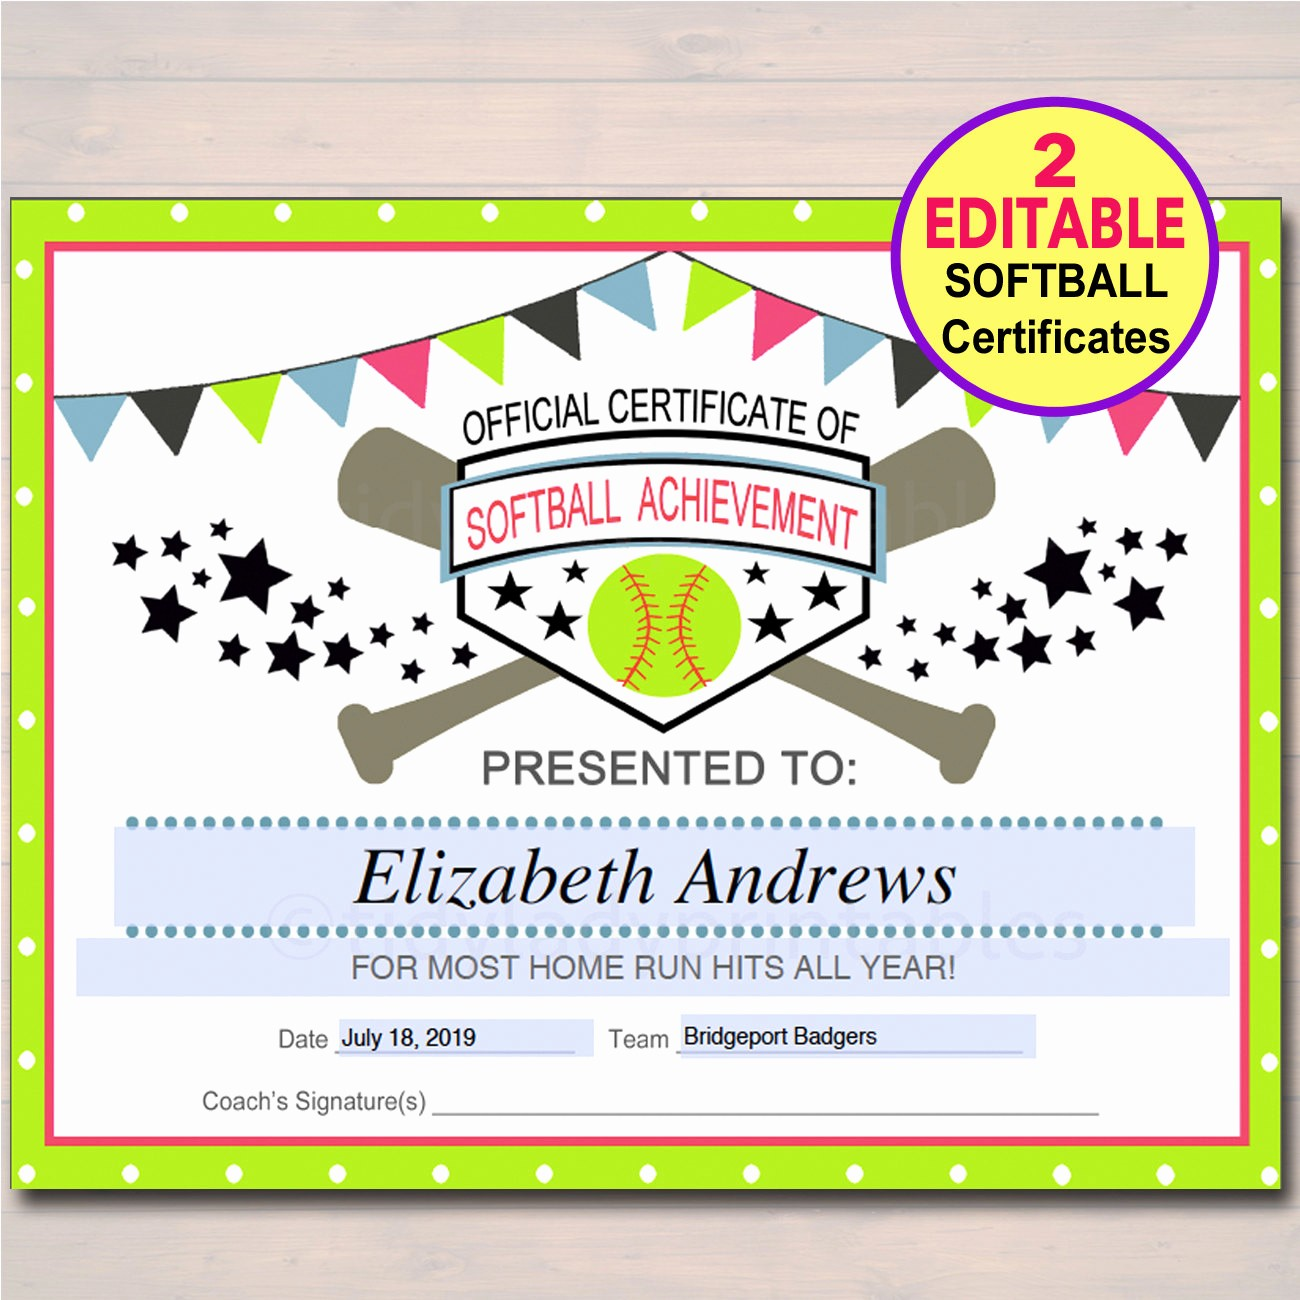 Free softball Certificates to Print Unique Editable softball Certificates Instant Download softball